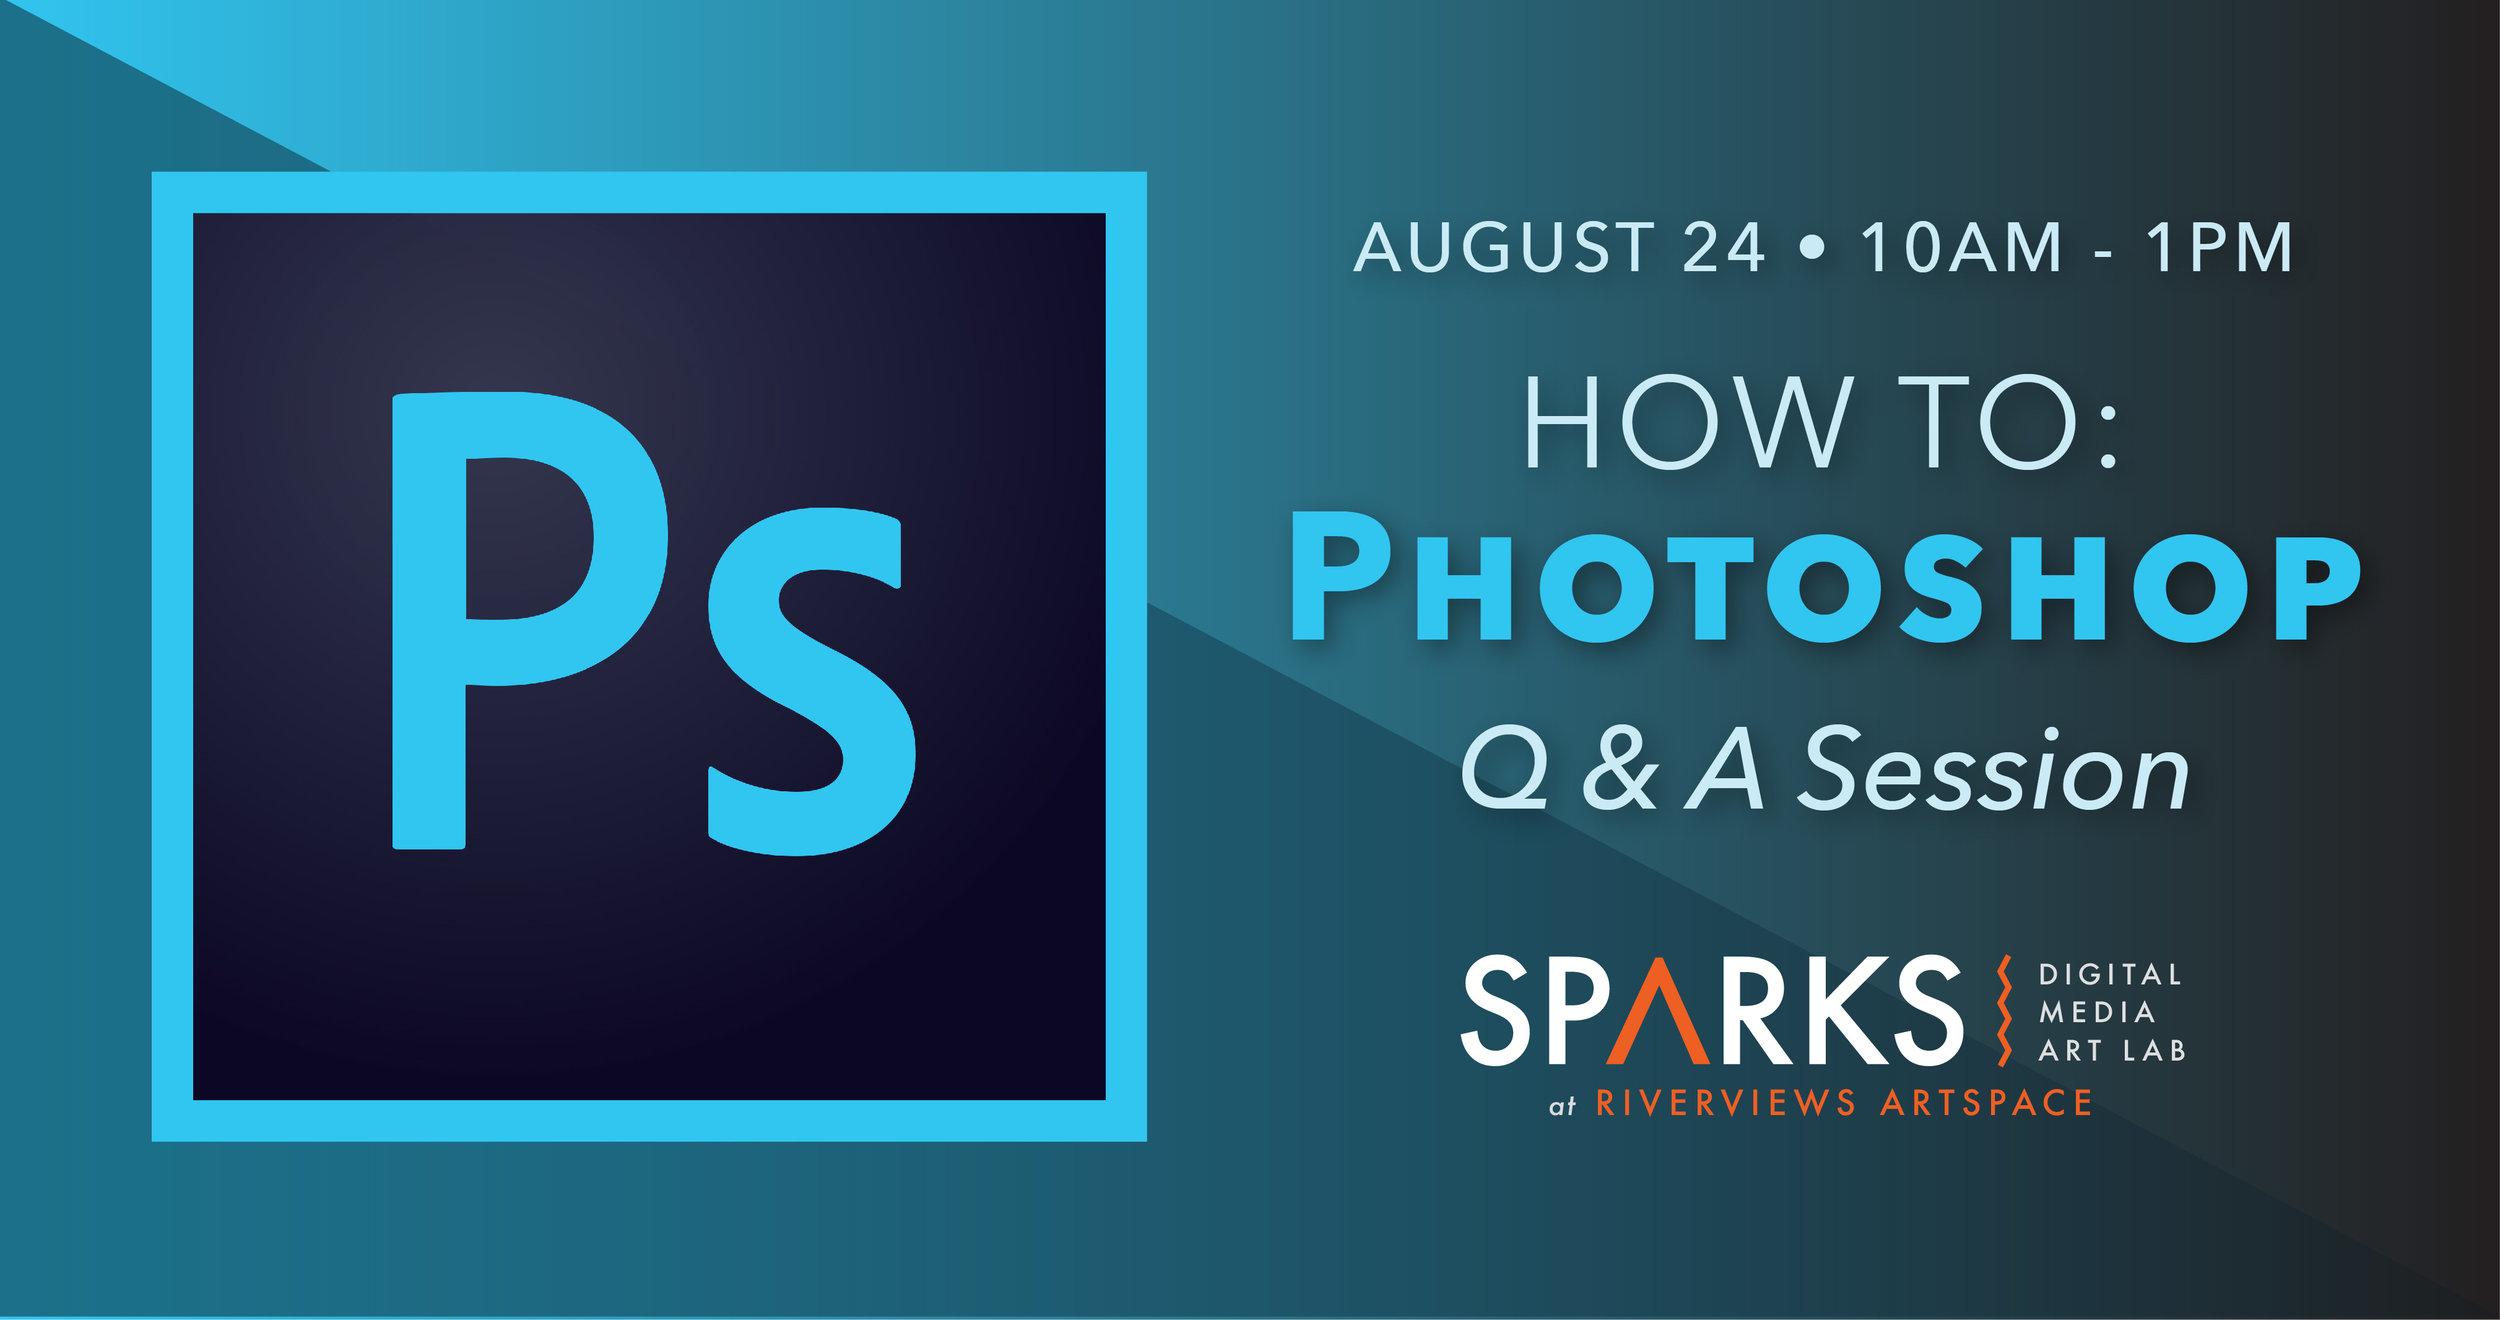 Sparks_PhotoshopQA_819_Erik_FB Image-01.jpg